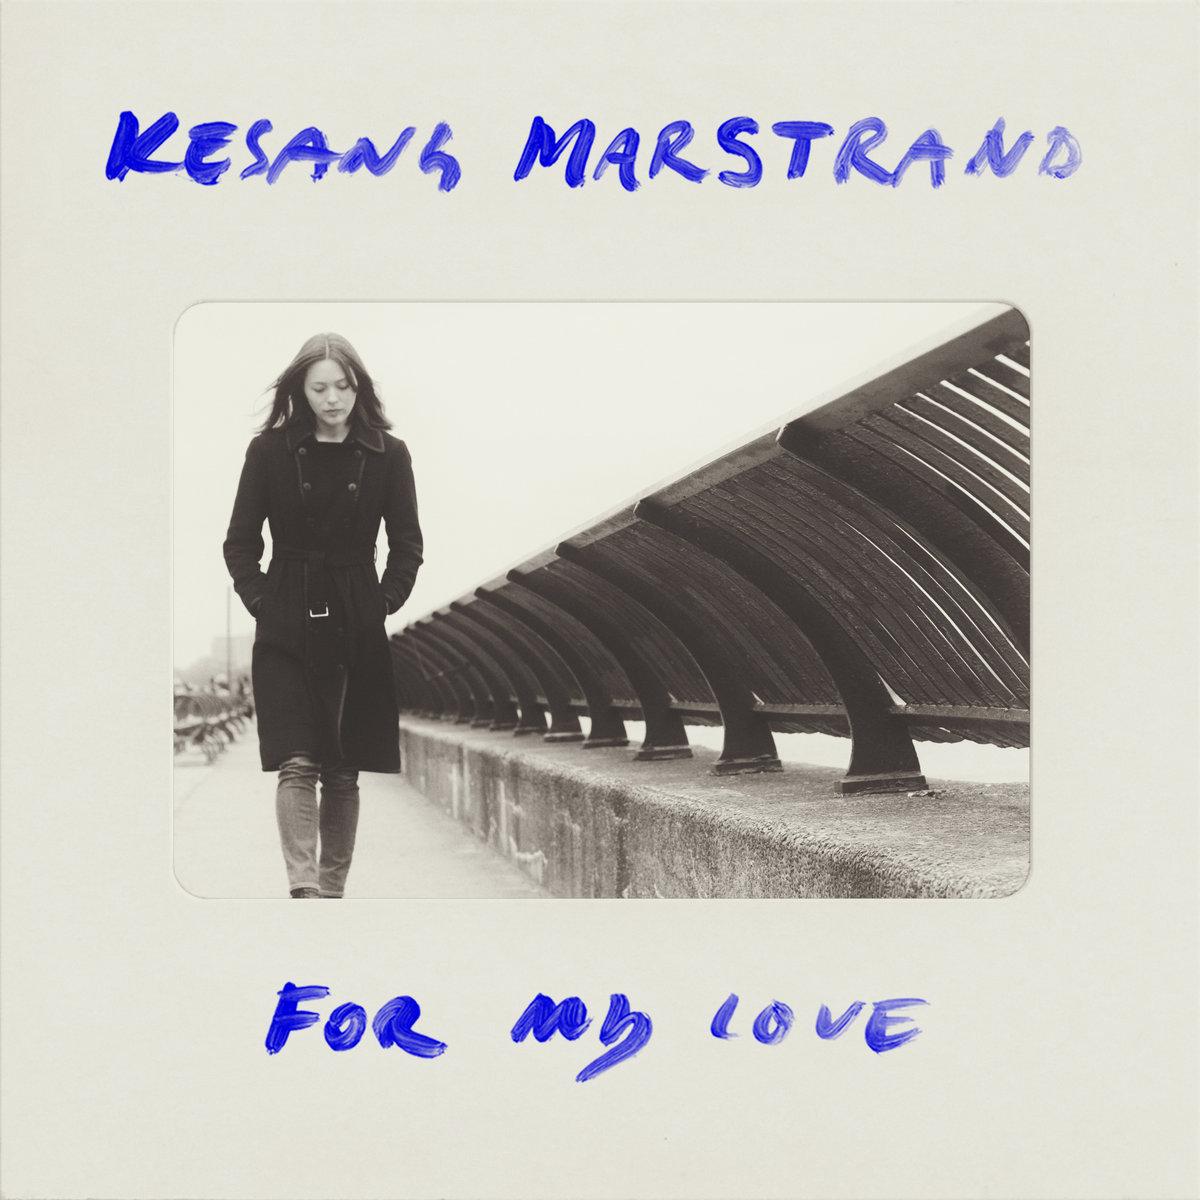 For My Love Kesang Marstrand